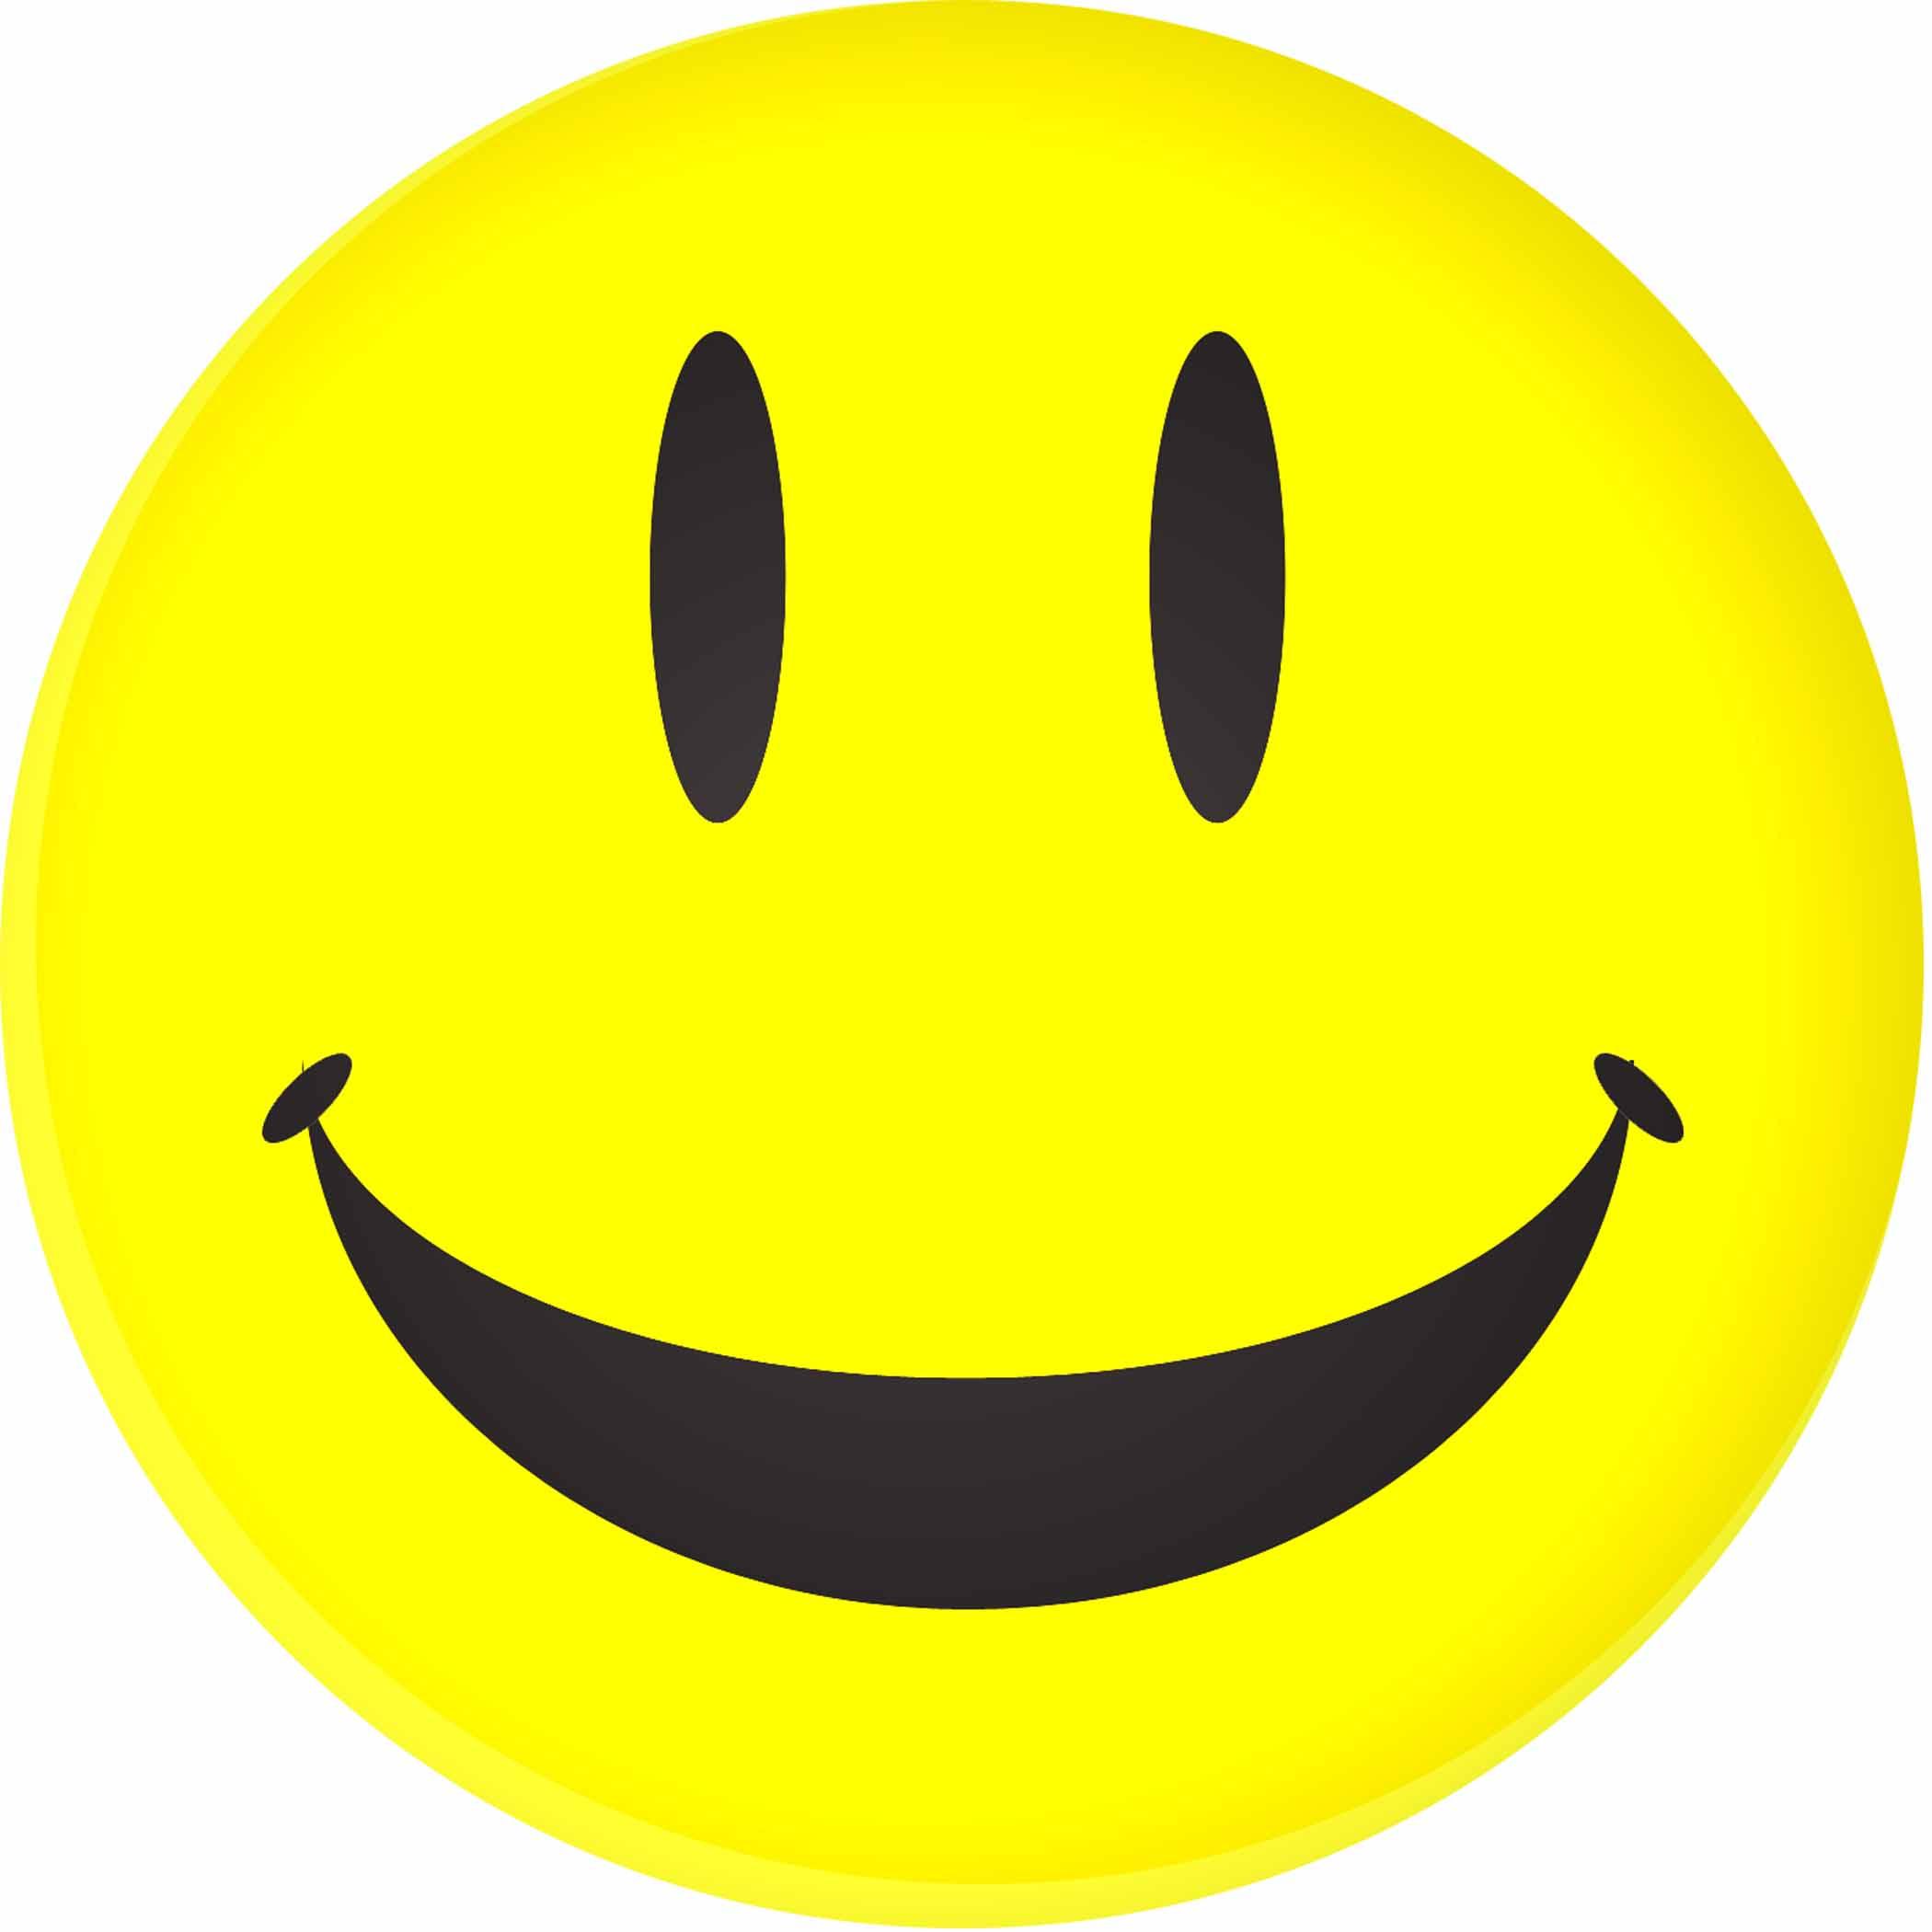 Smiley Face Clipart.